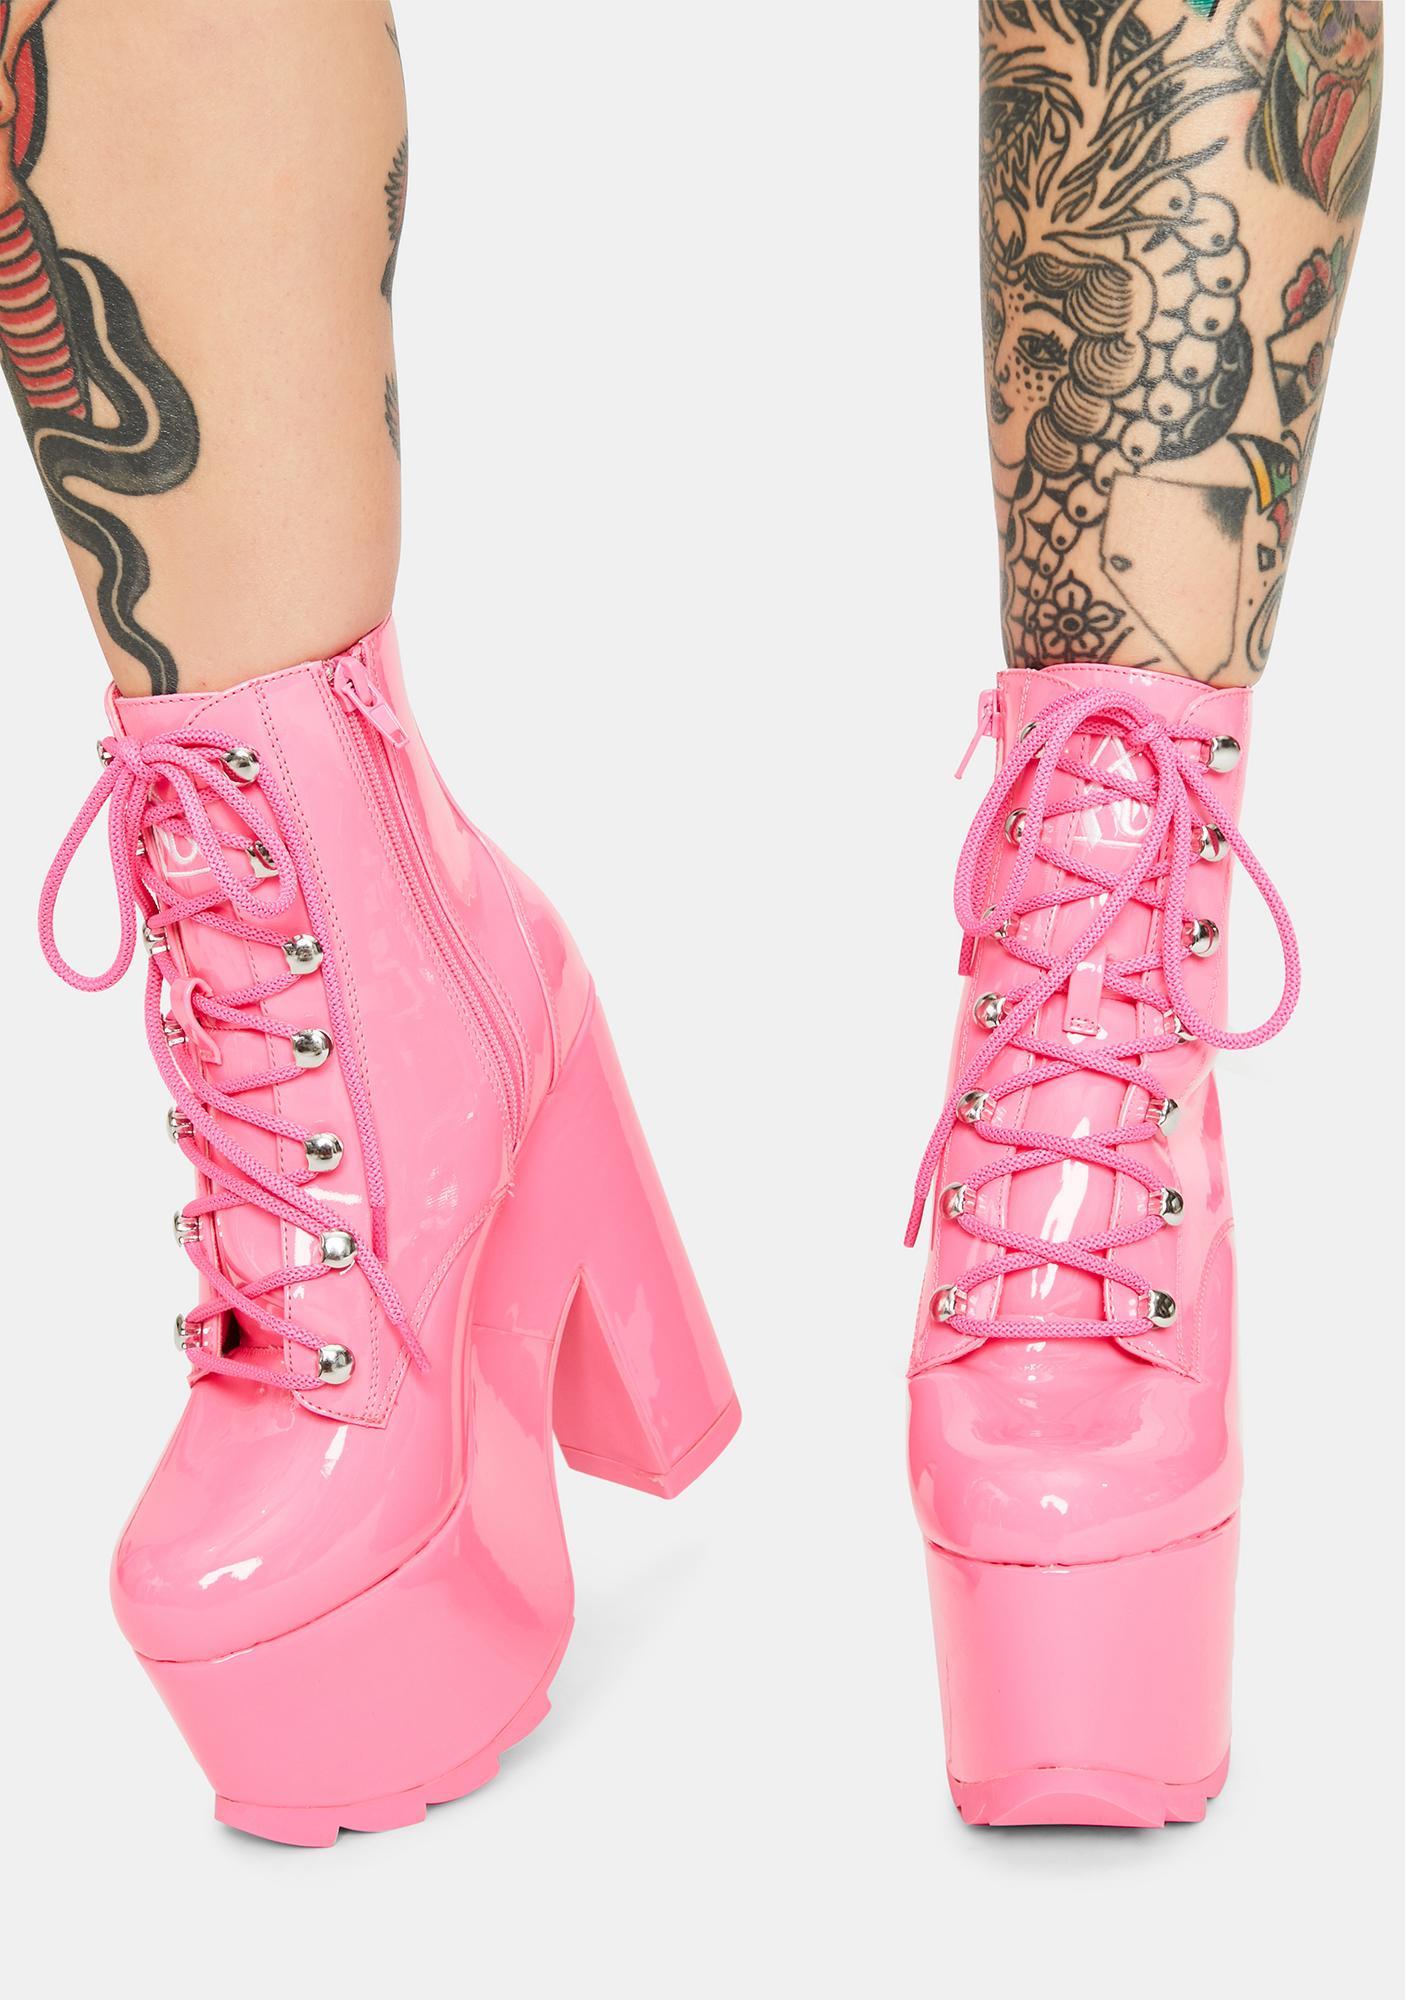 Y.R.U. Night Terror Pink Patent Platform Boots